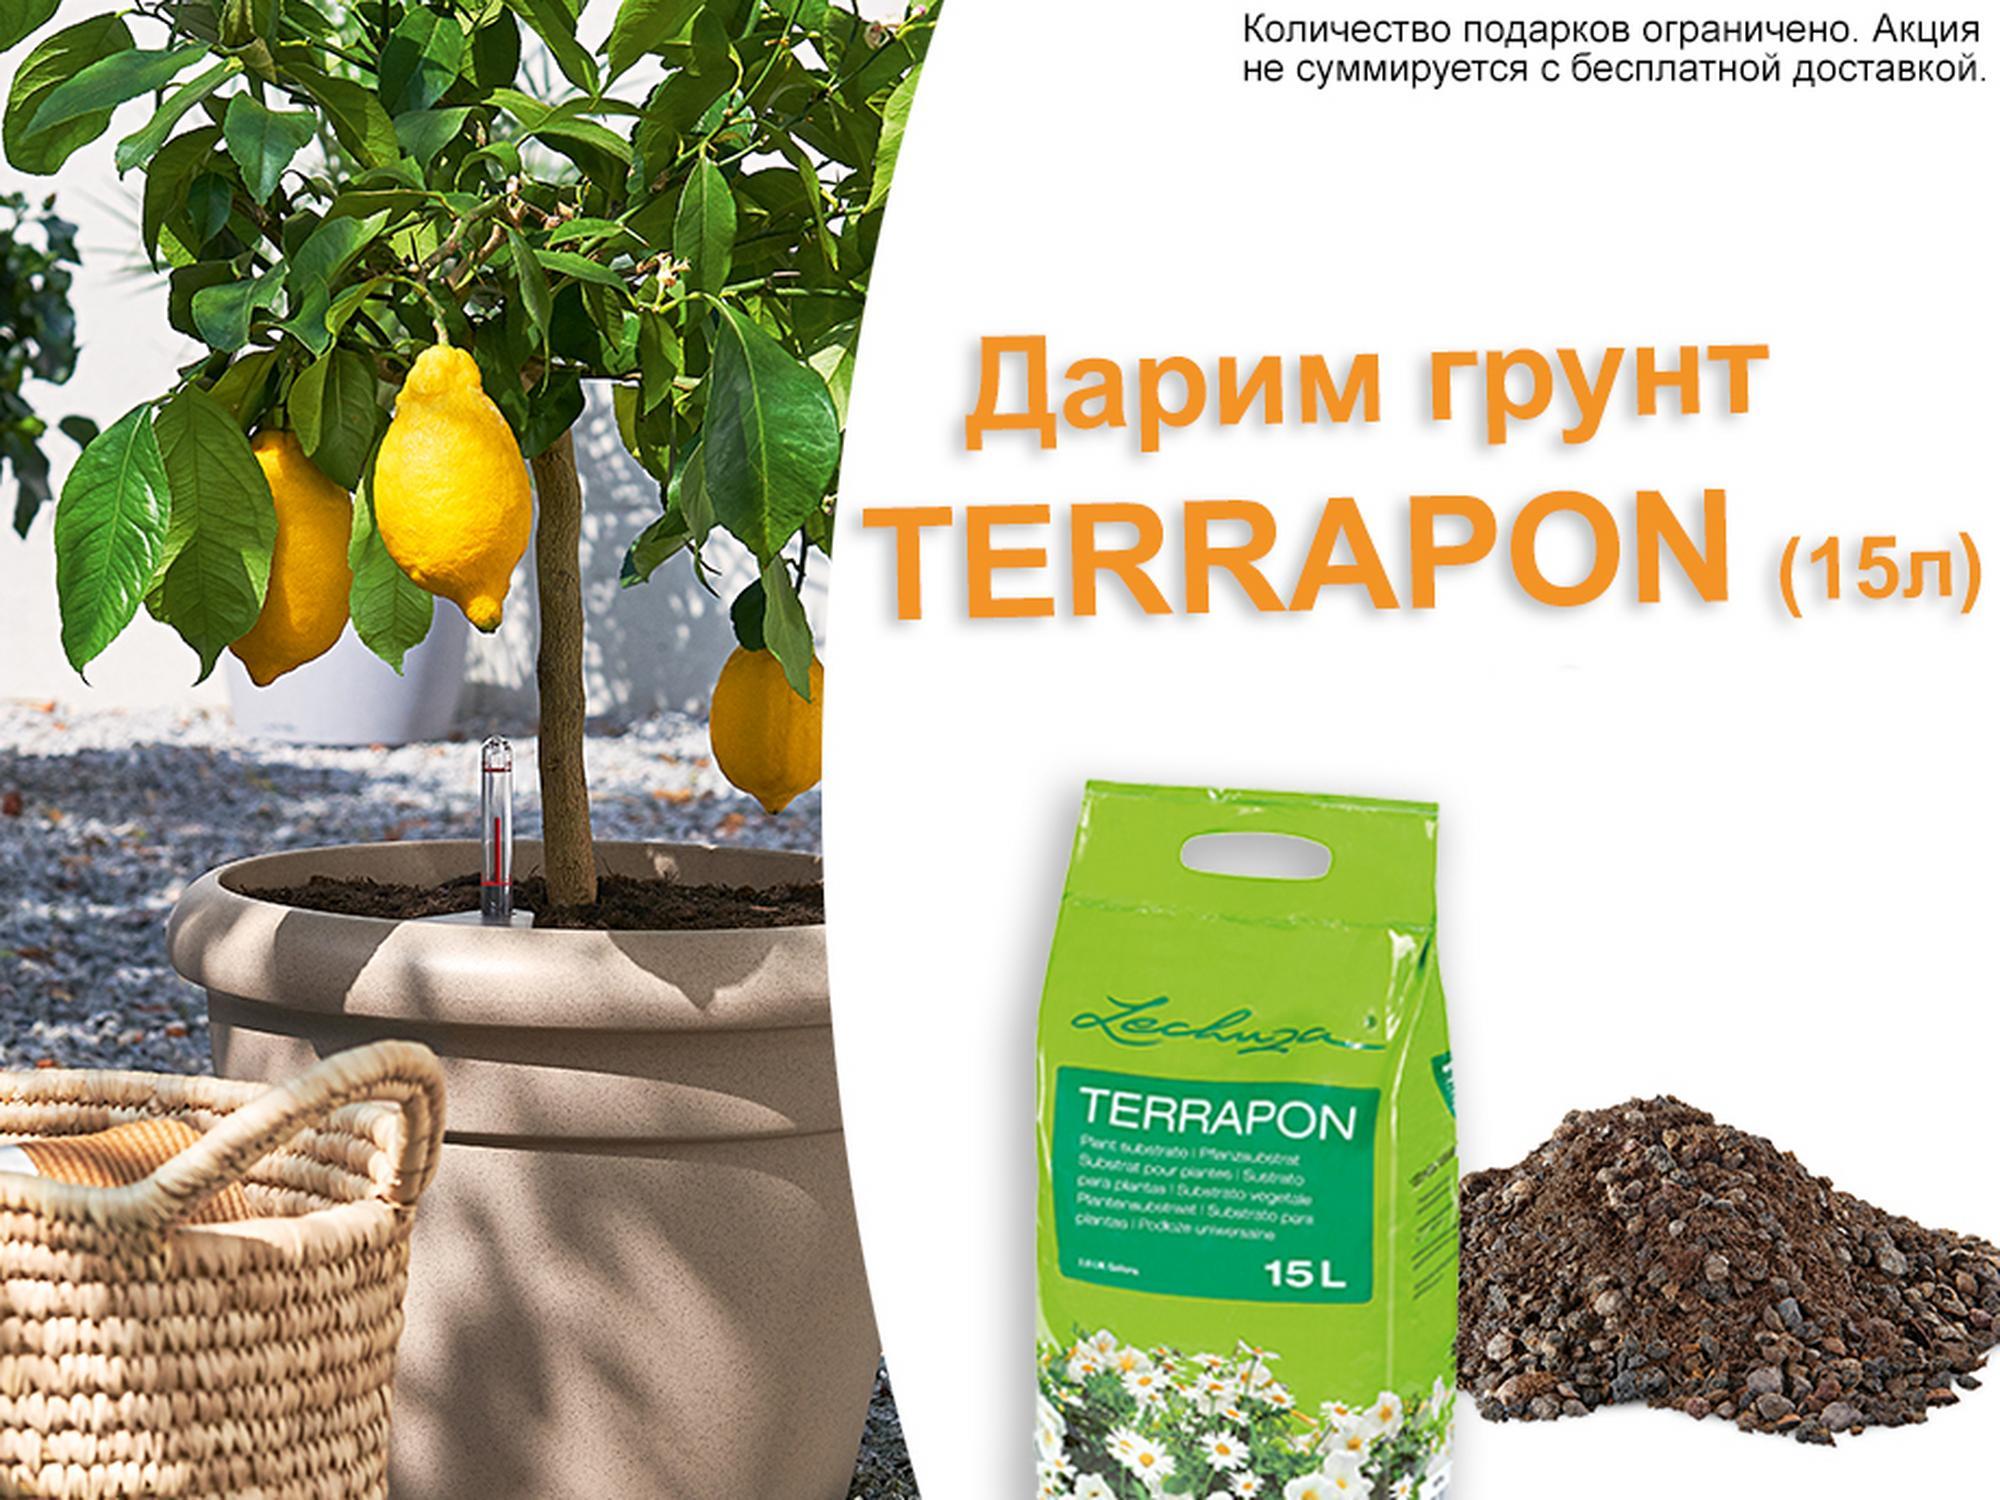 hero_banner_terrapon072019_xs_ru